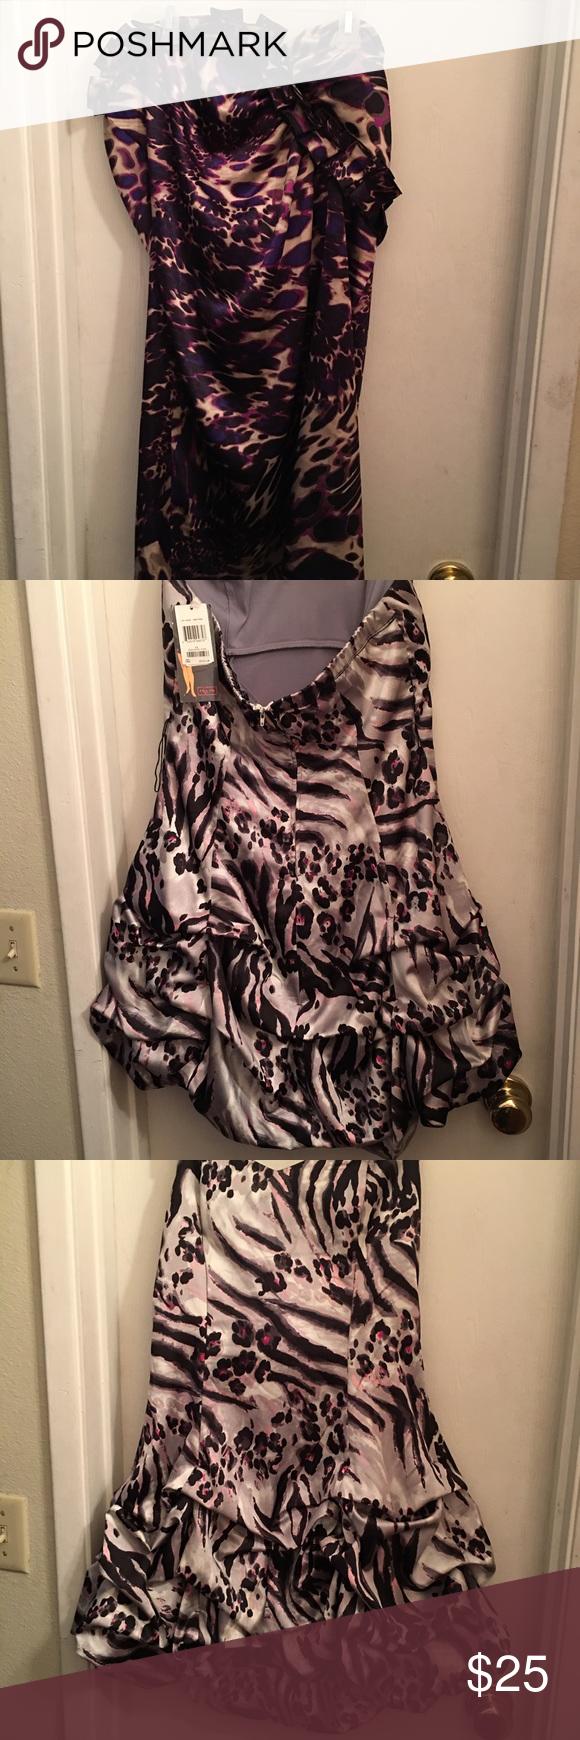 Great prom dress new swisher bottom. So cute | Jessica simpsons ...